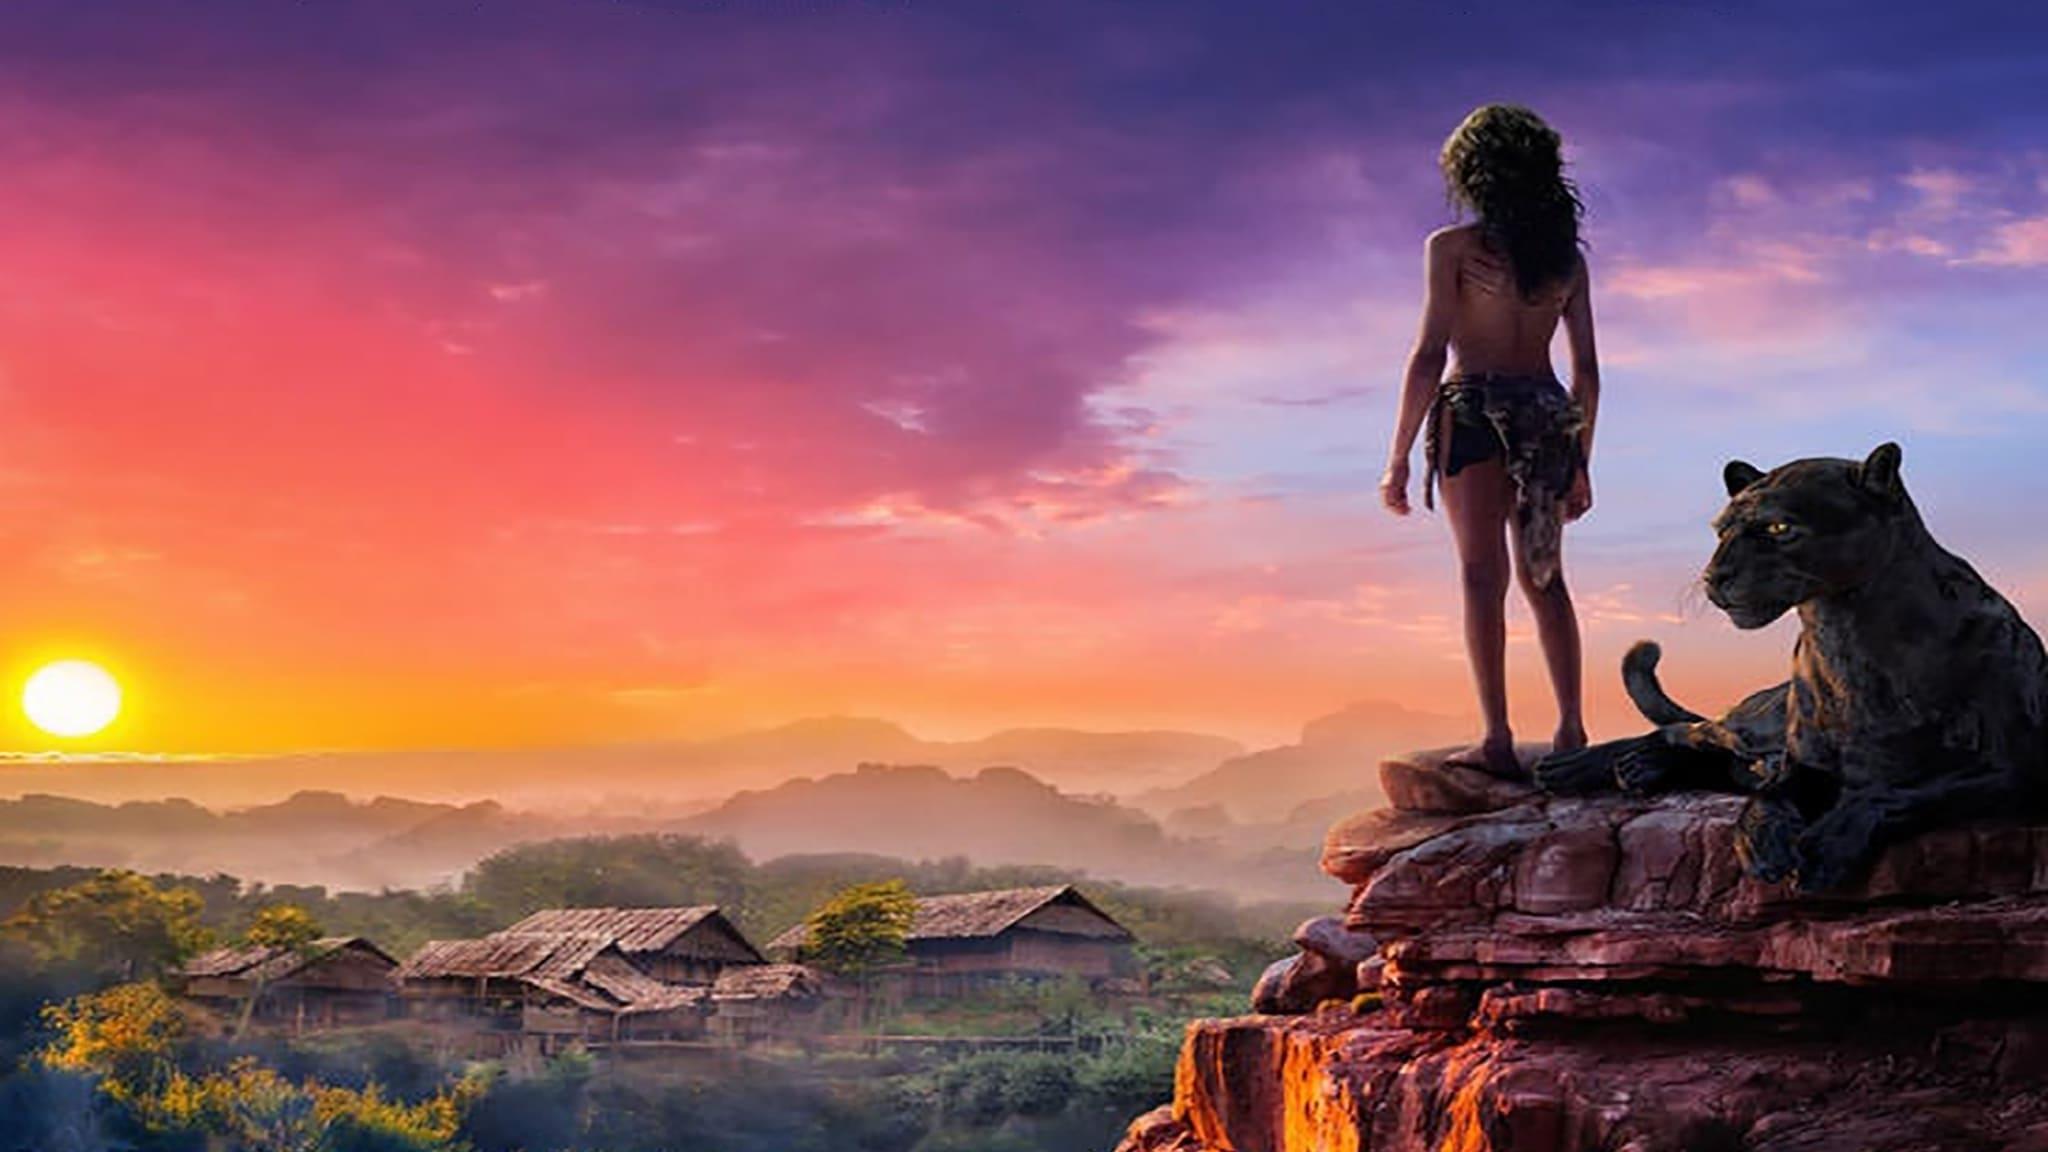 Mogli: Orman Çocuğu 2018 Film indir – Torrent indir – Full İndir